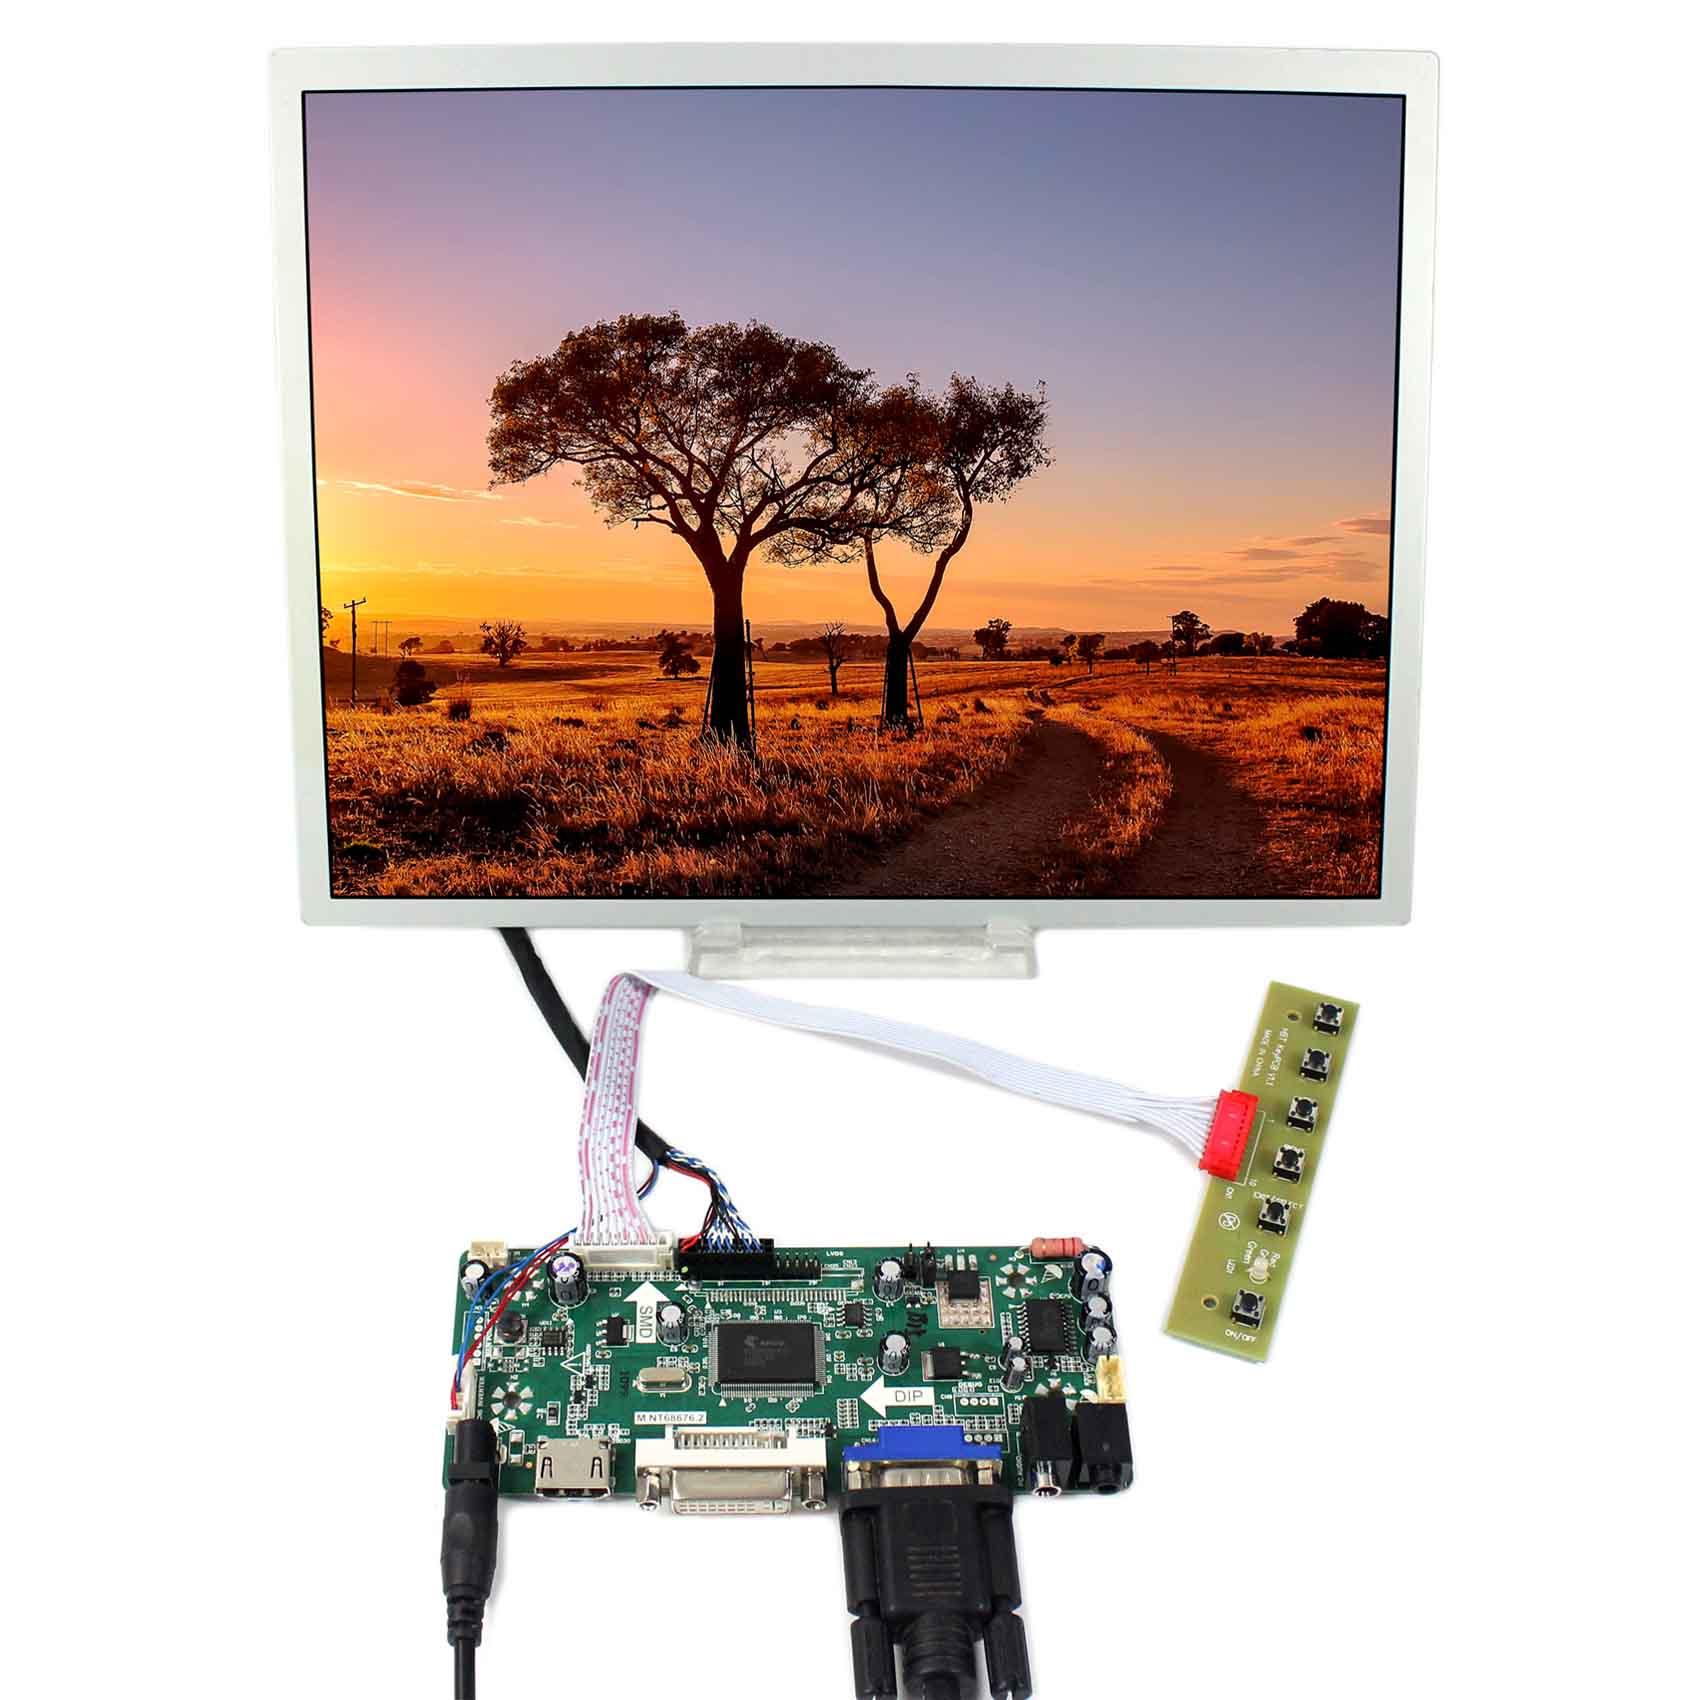 12.1inch LQ121S1LG75 800x600 LCD Screen+HDMI DVI VGA Audio LCD Controller Board M.NT6867612.1inch LQ121S1LG75 800x600 LCD Screen+HDMI DVI VGA Audio LCD Controller Board M.NT68676